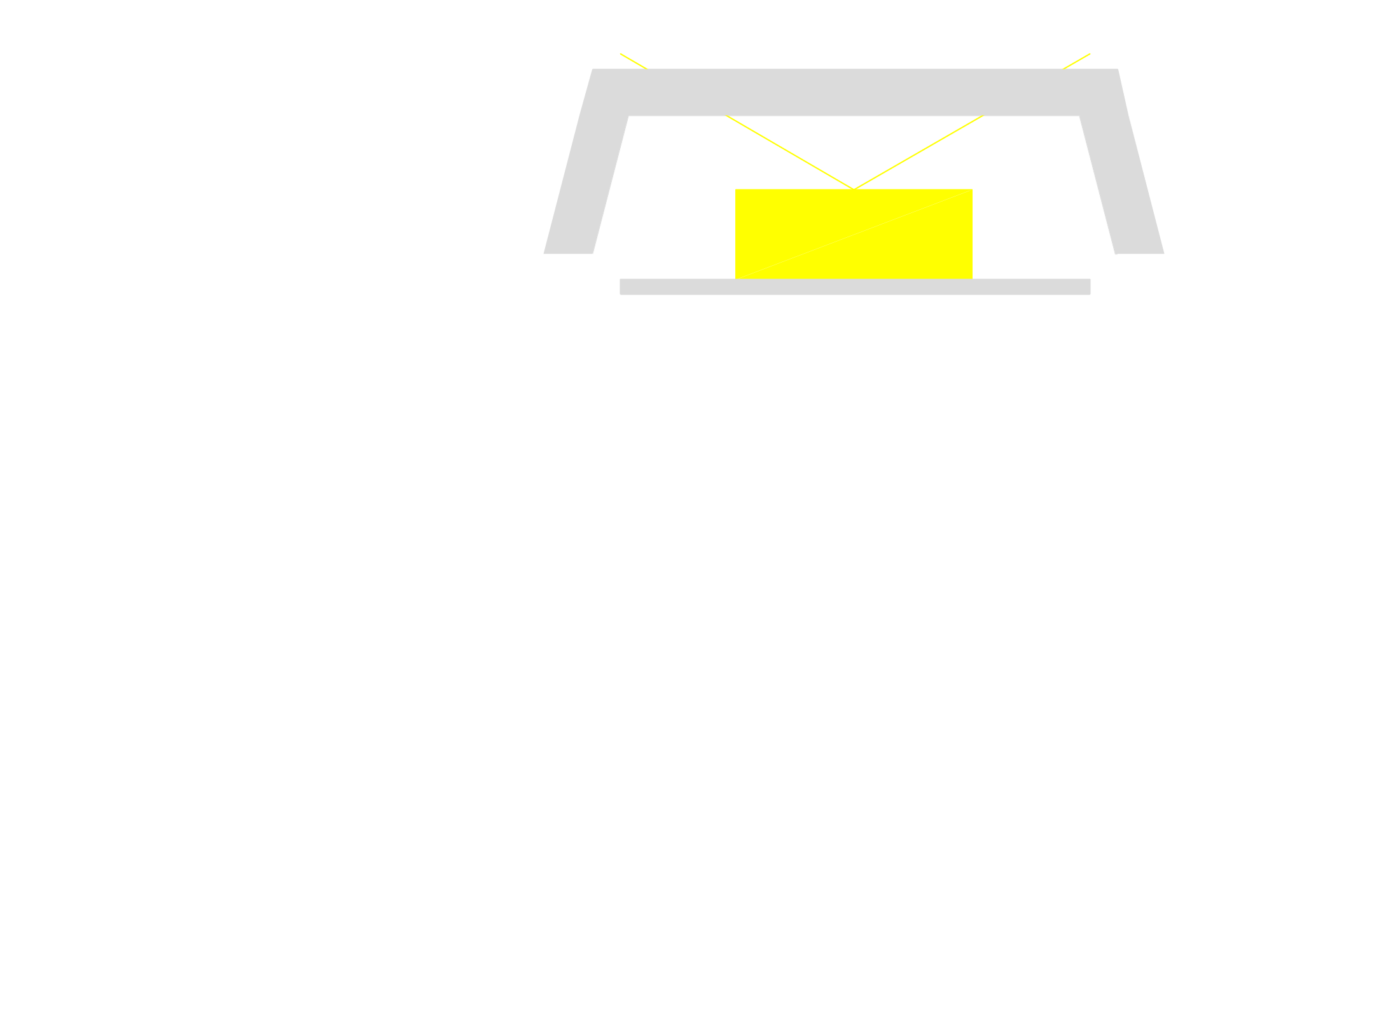 ar5-bond-22